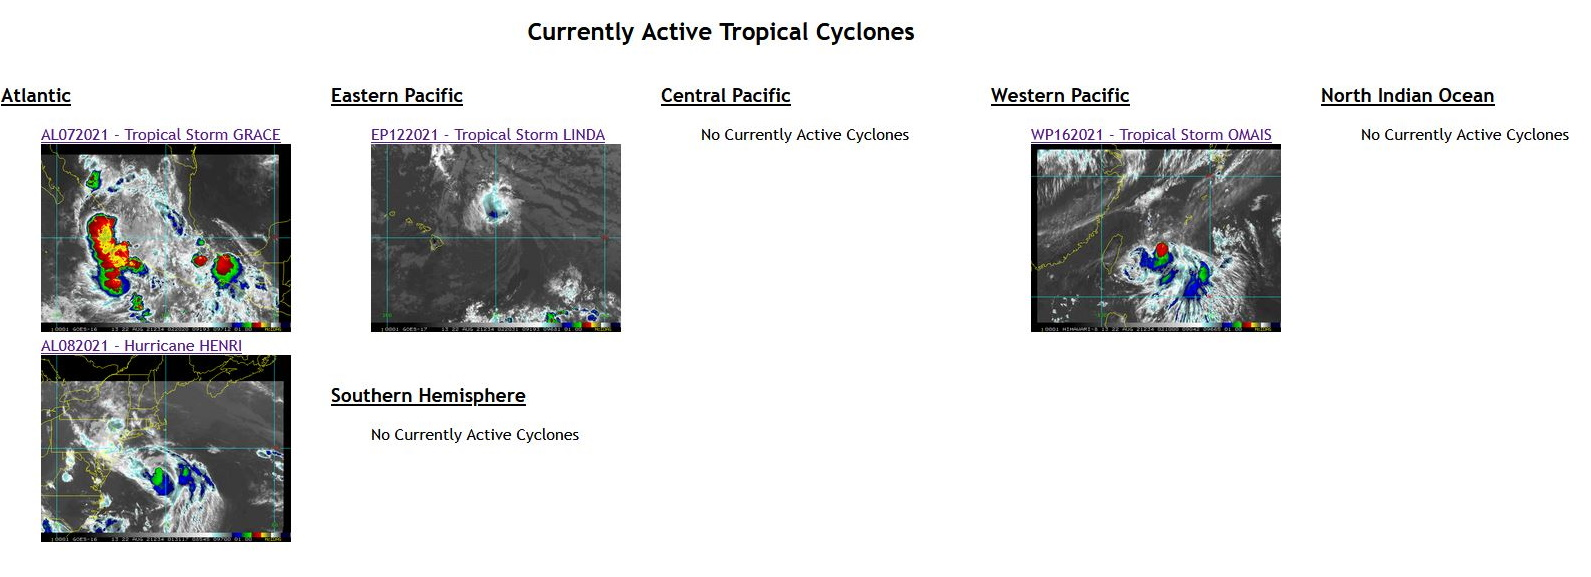 22/02UTC. CURRENT TROPICAL CYCLONE ACTIVITY WORLDWIDE.